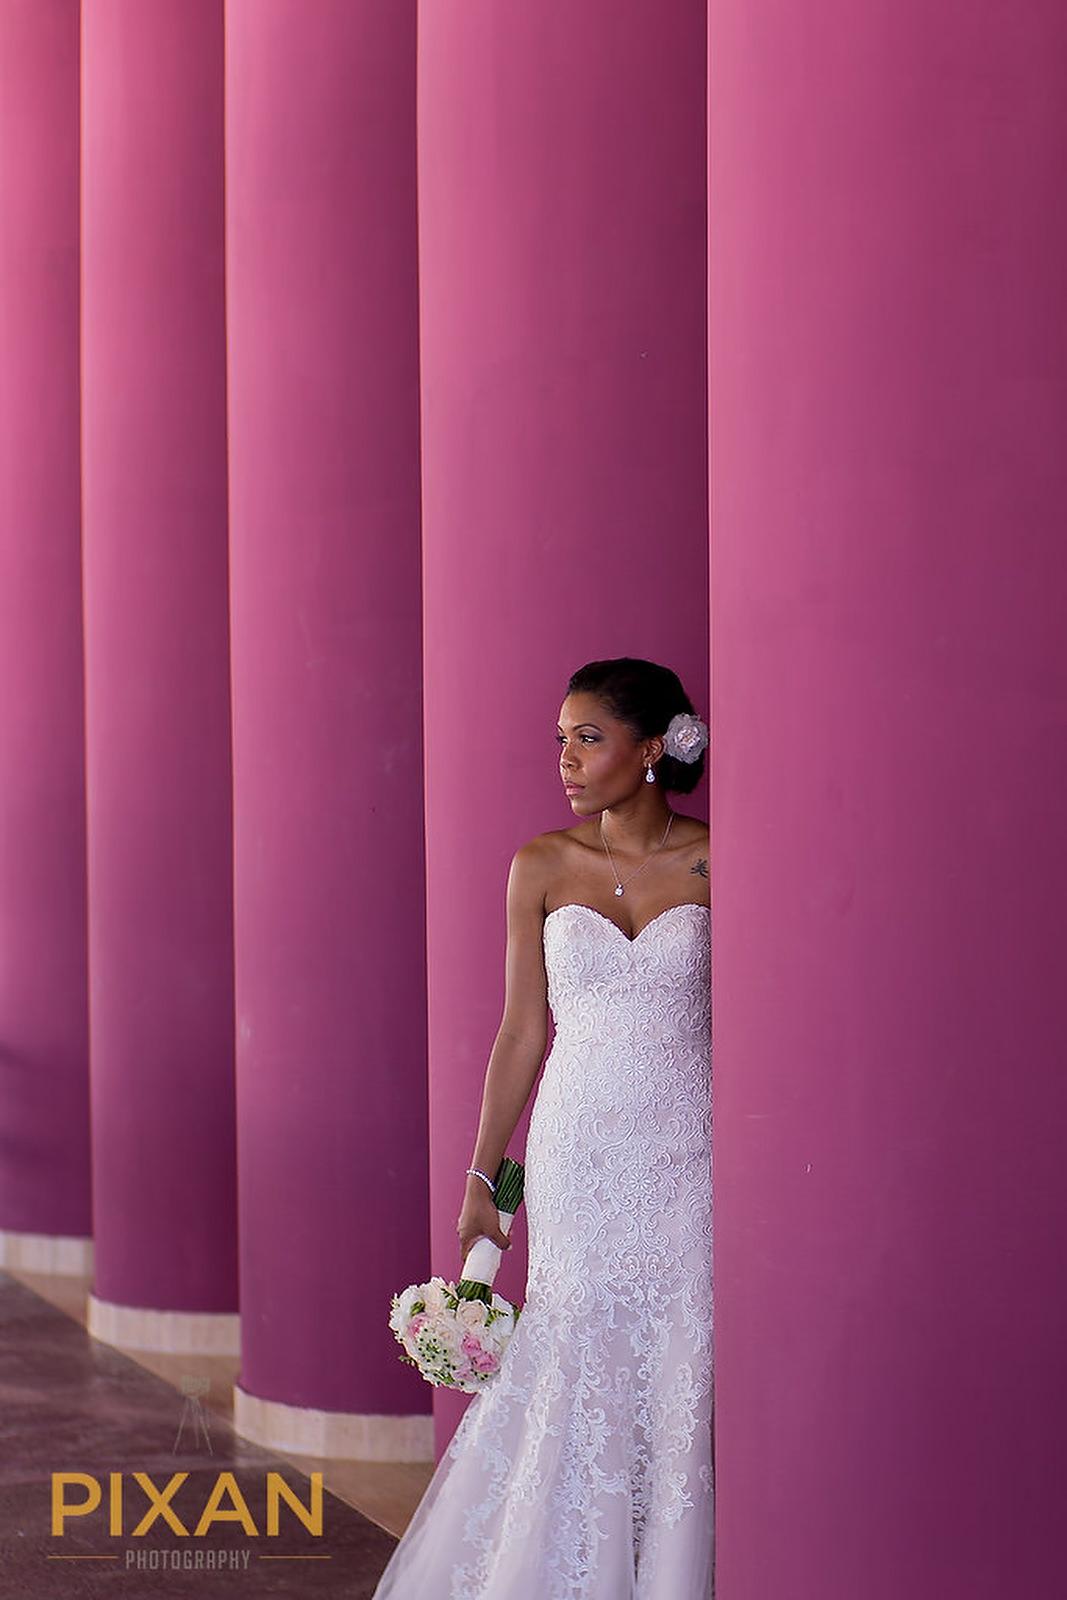 Hyatt Ziva Cancun pink bride